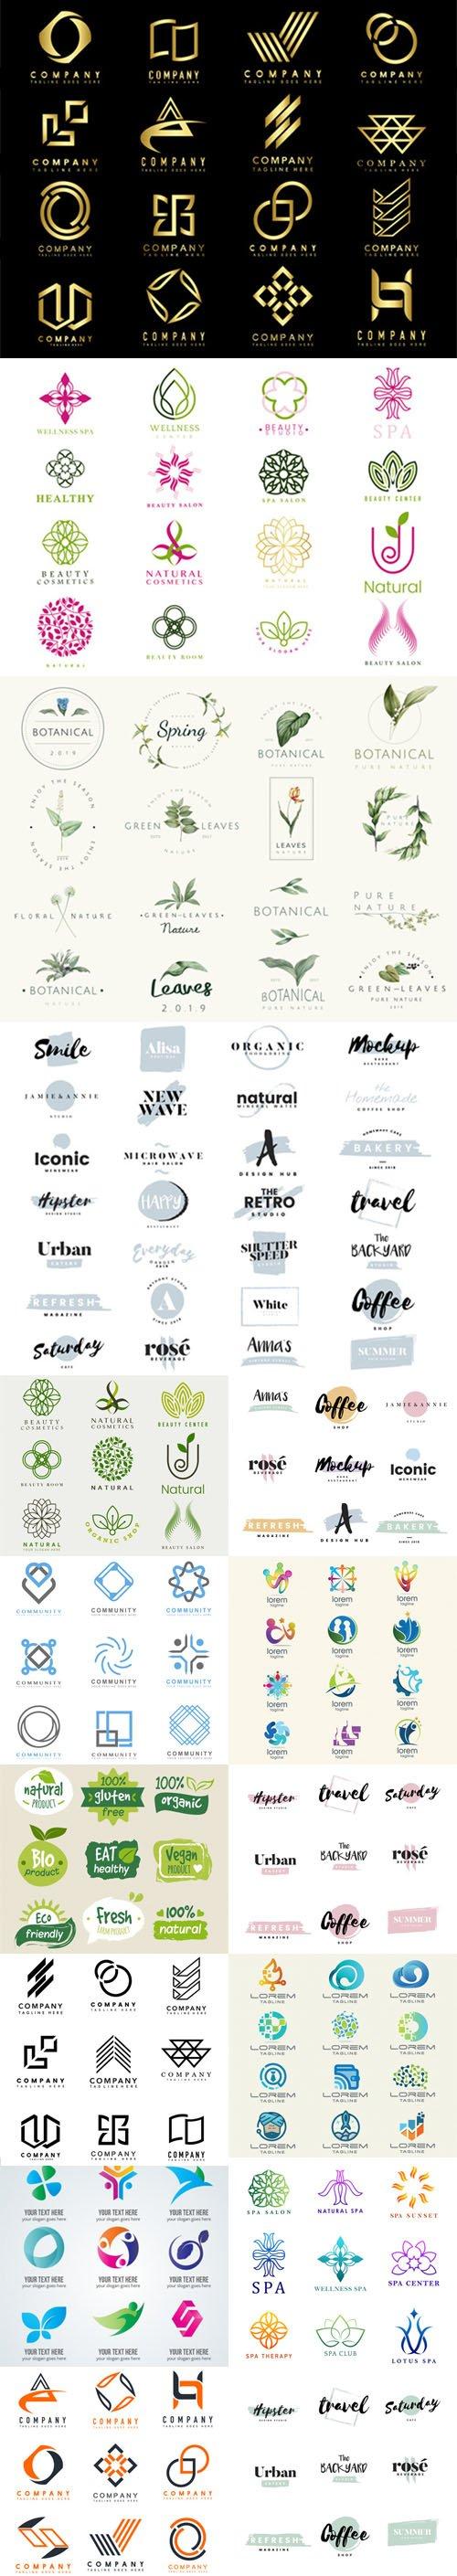 Colorful Logos & Branding Vector Collection